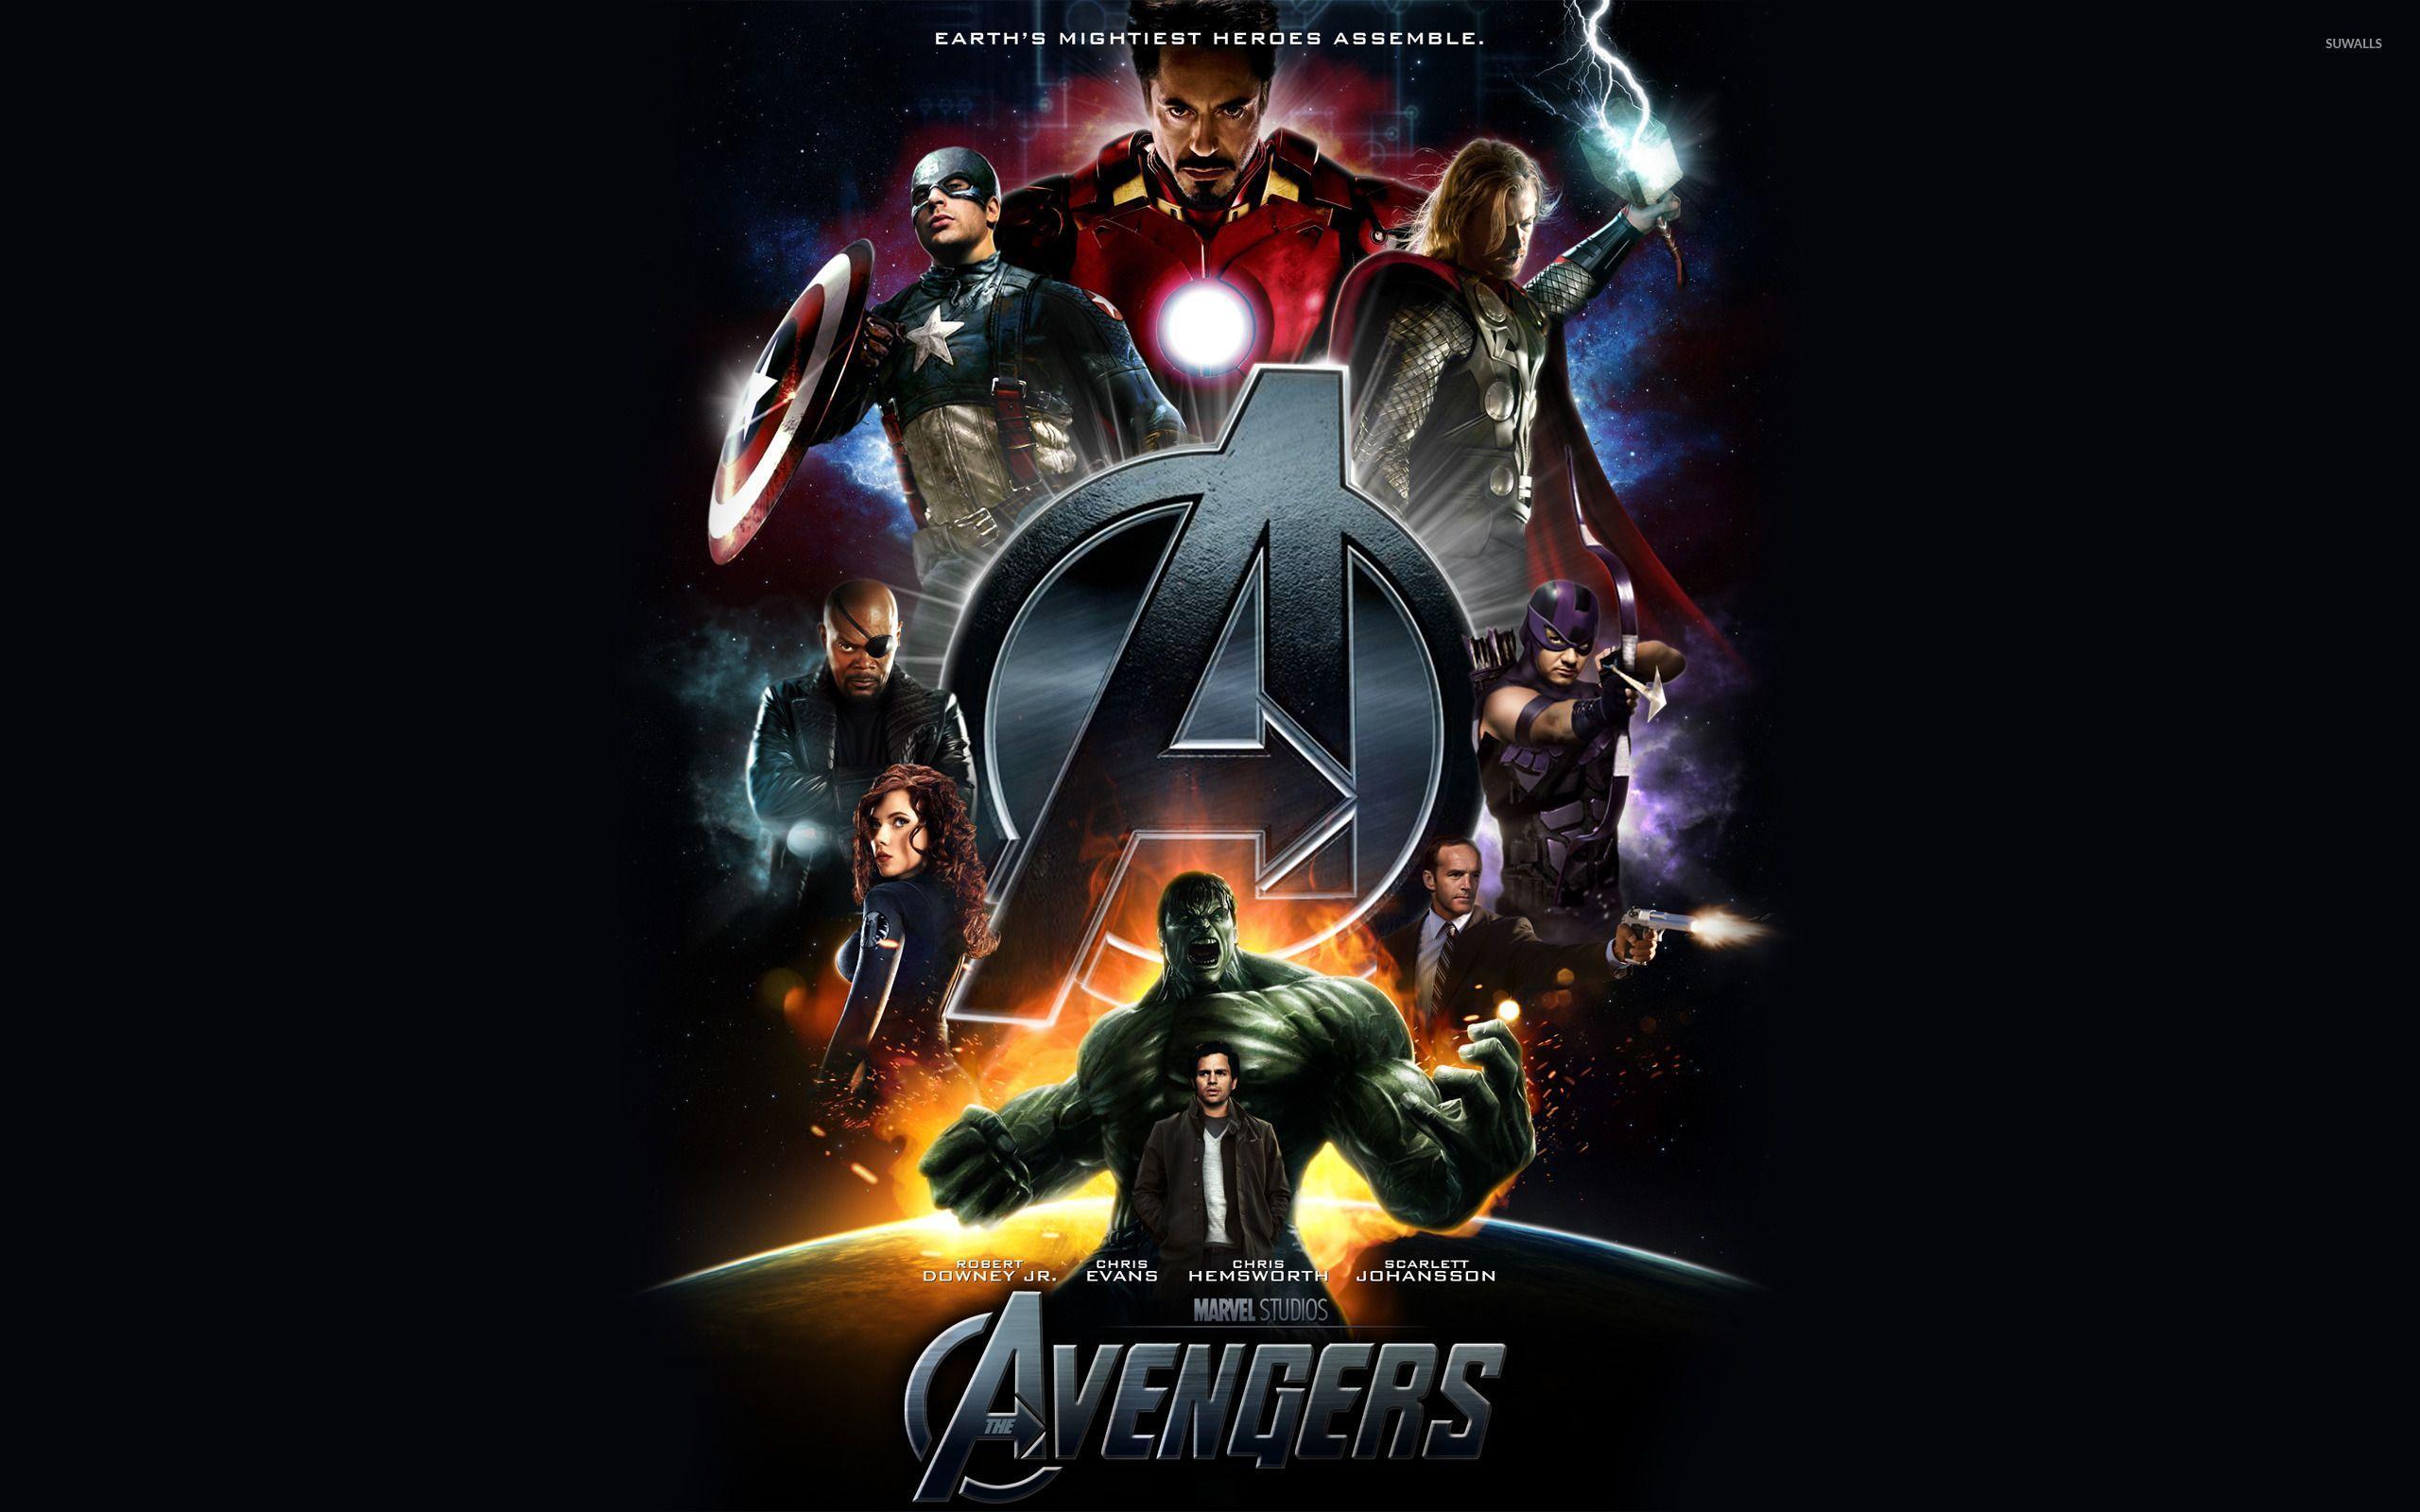 Avengers 2 Wallpapers